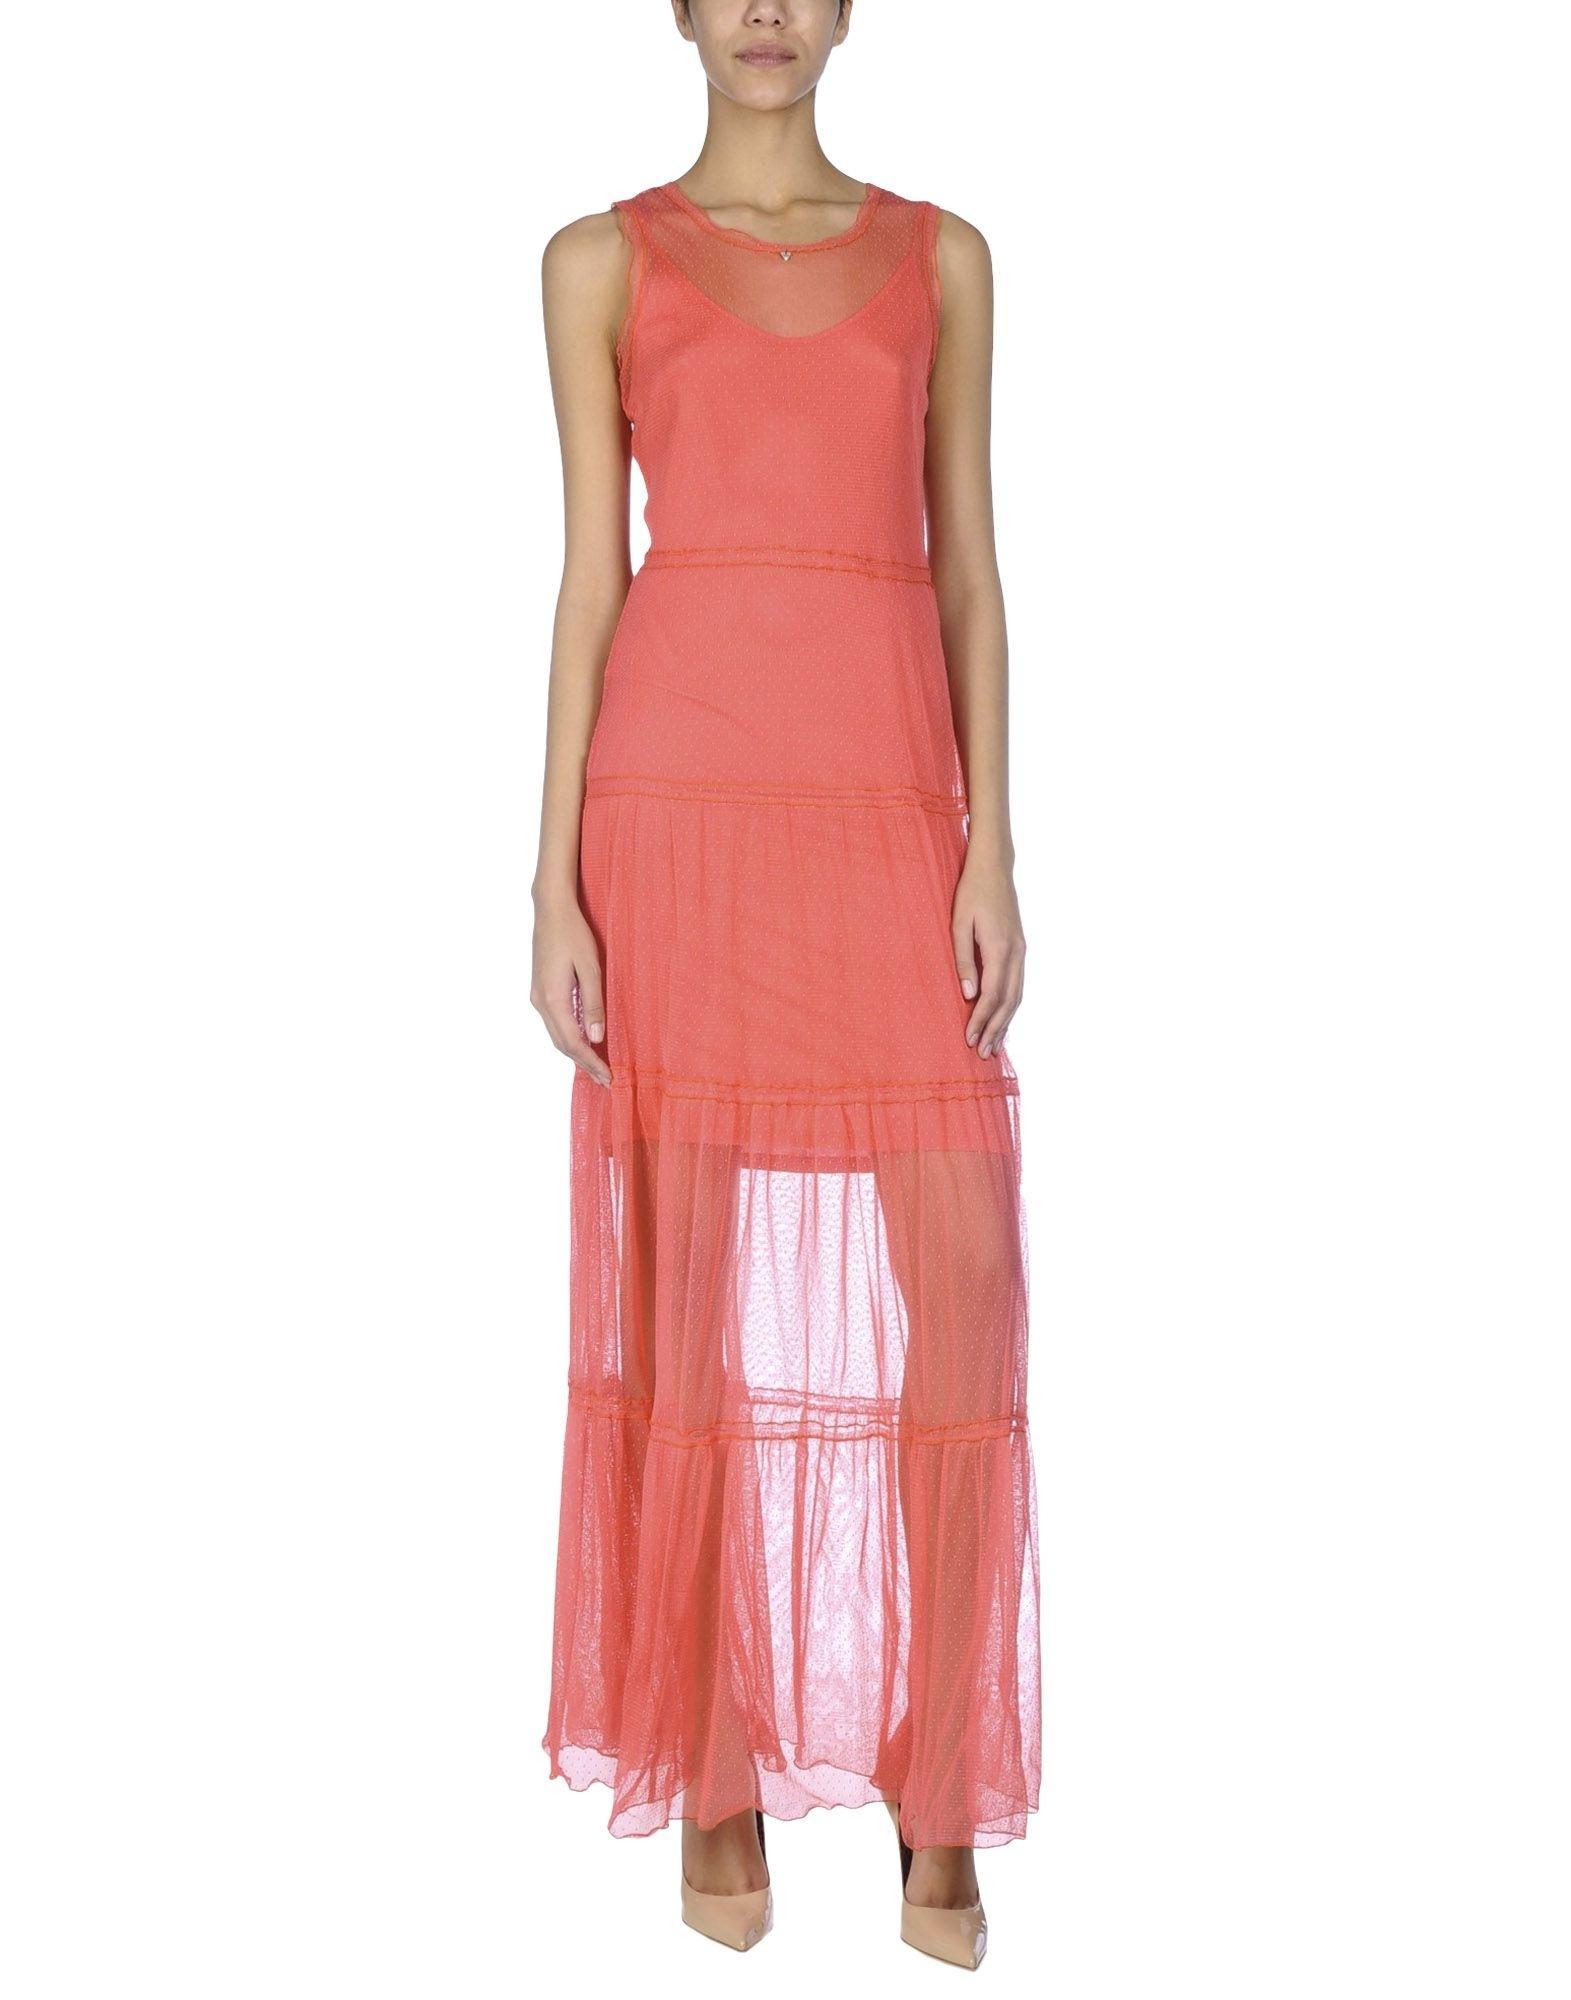 Abend Top Kleid Koralle Stylish10 Kreativ Kleid Koralle Stylish